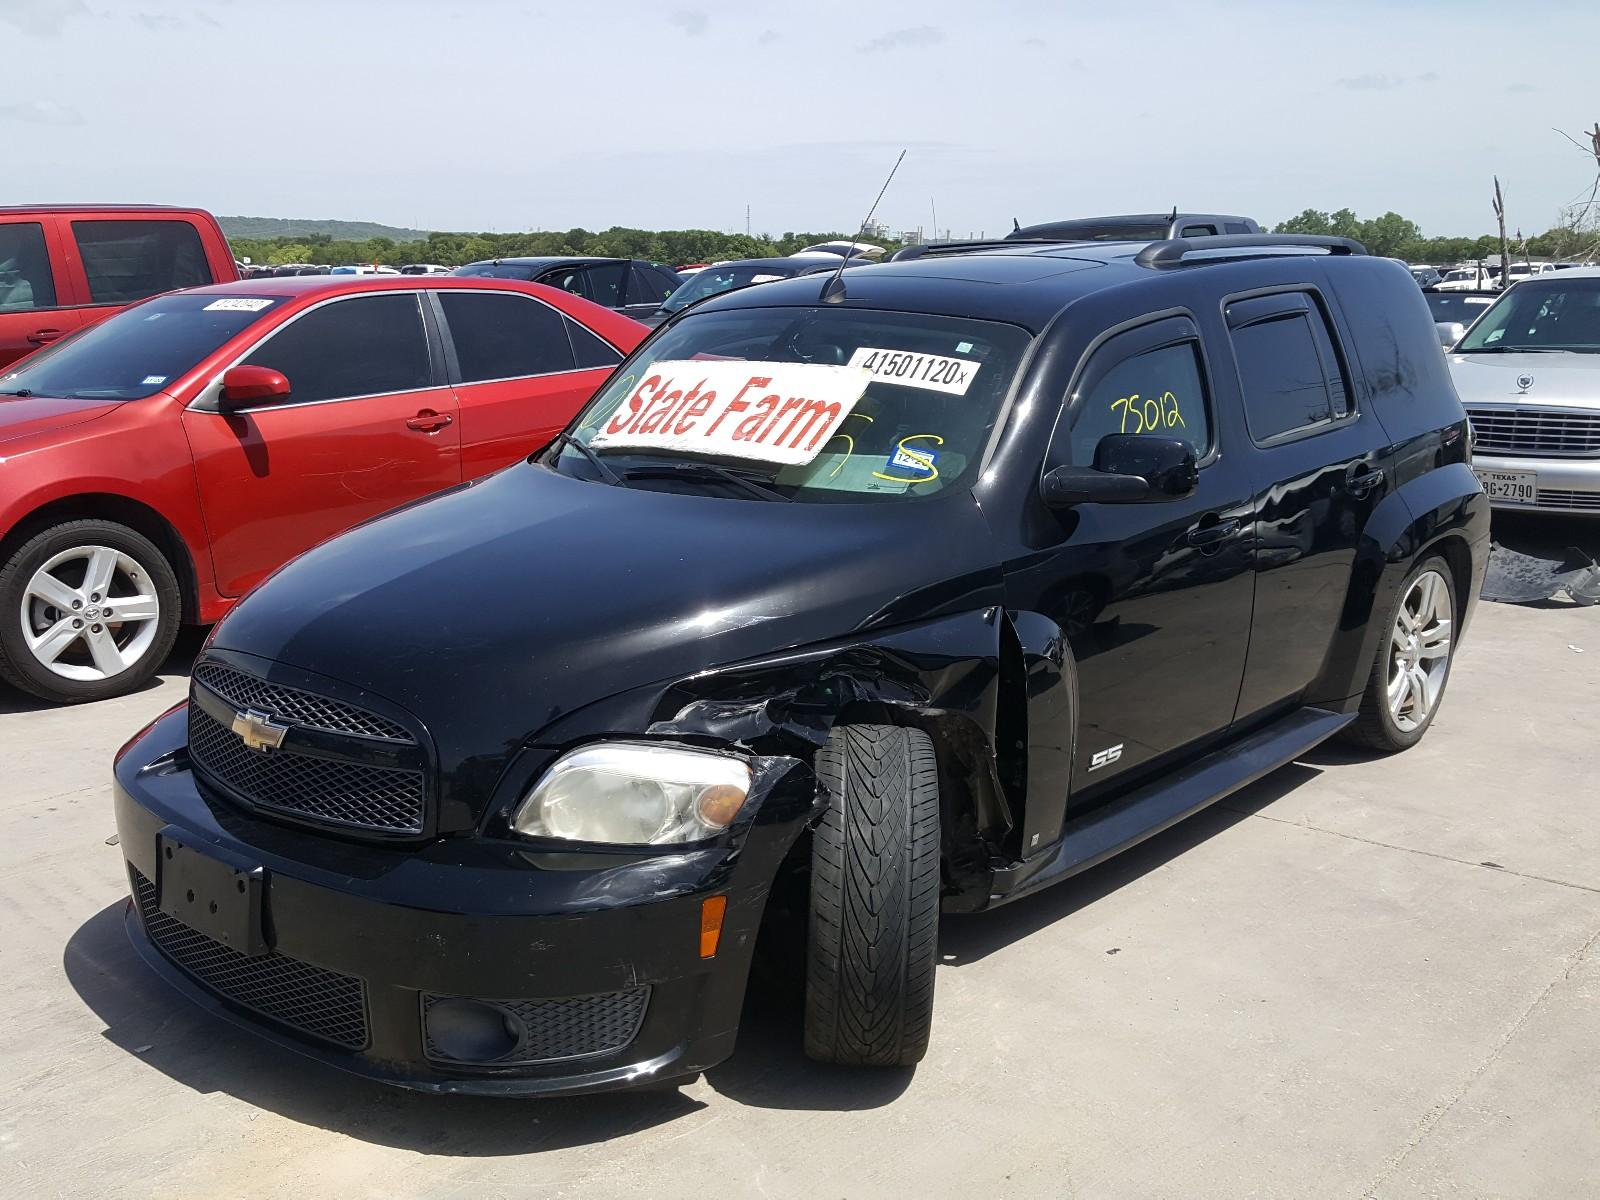 2009 Chevrolet Hhr Ss For Sale At Copart Grand Prairie Tx Lot